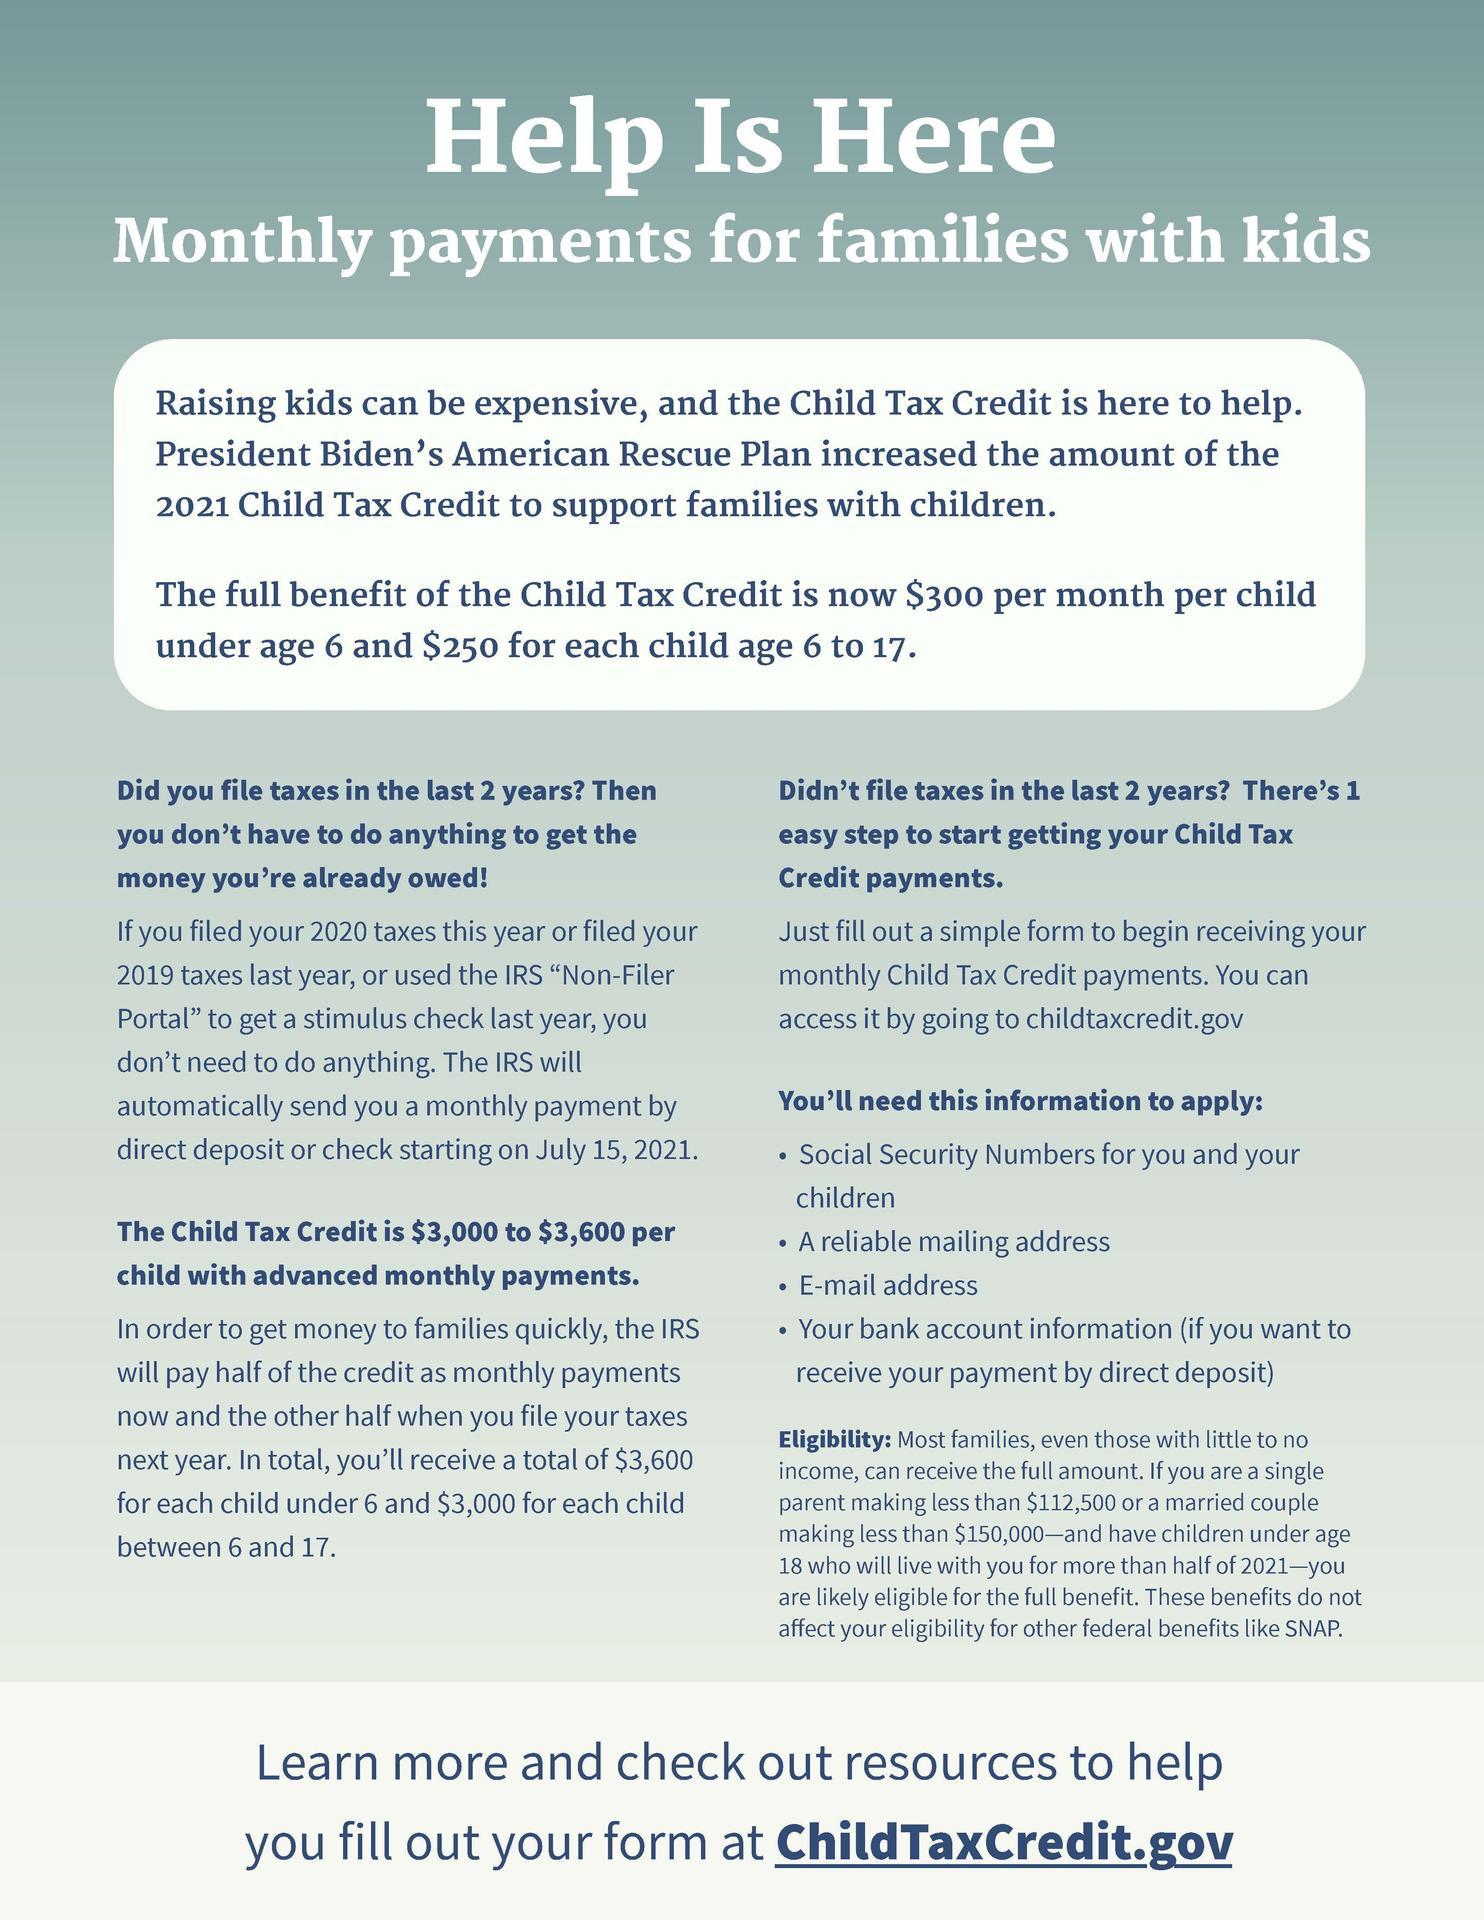 child tax credit information